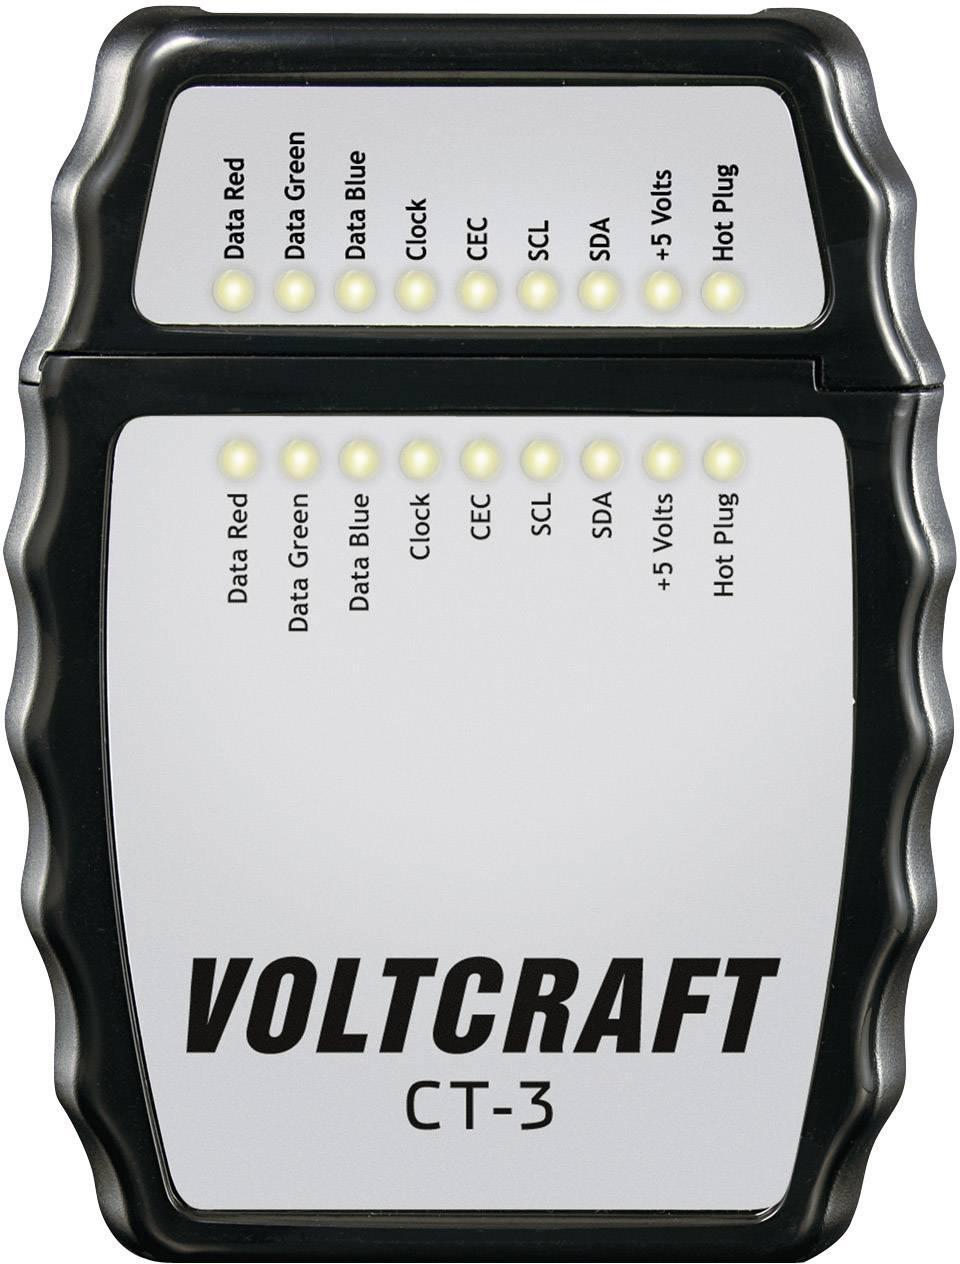 Tester pre HDMI káble typu A Voltcraft CT-3